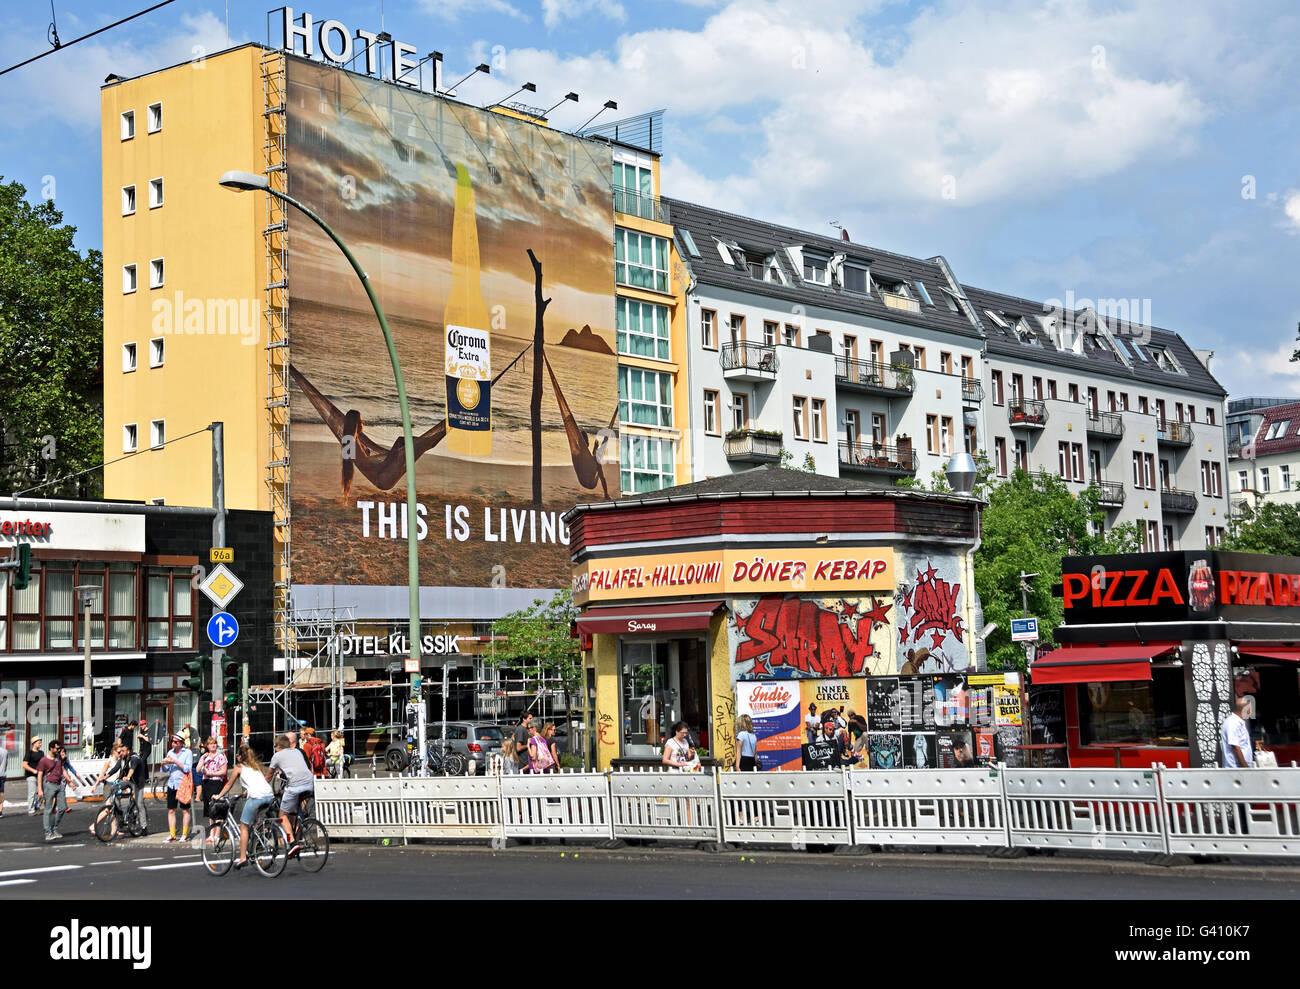 street fast food warschauer strasse friedrichshain kreuzberg stock photo royalty free image. Black Bedroom Furniture Sets. Home Design Ideas